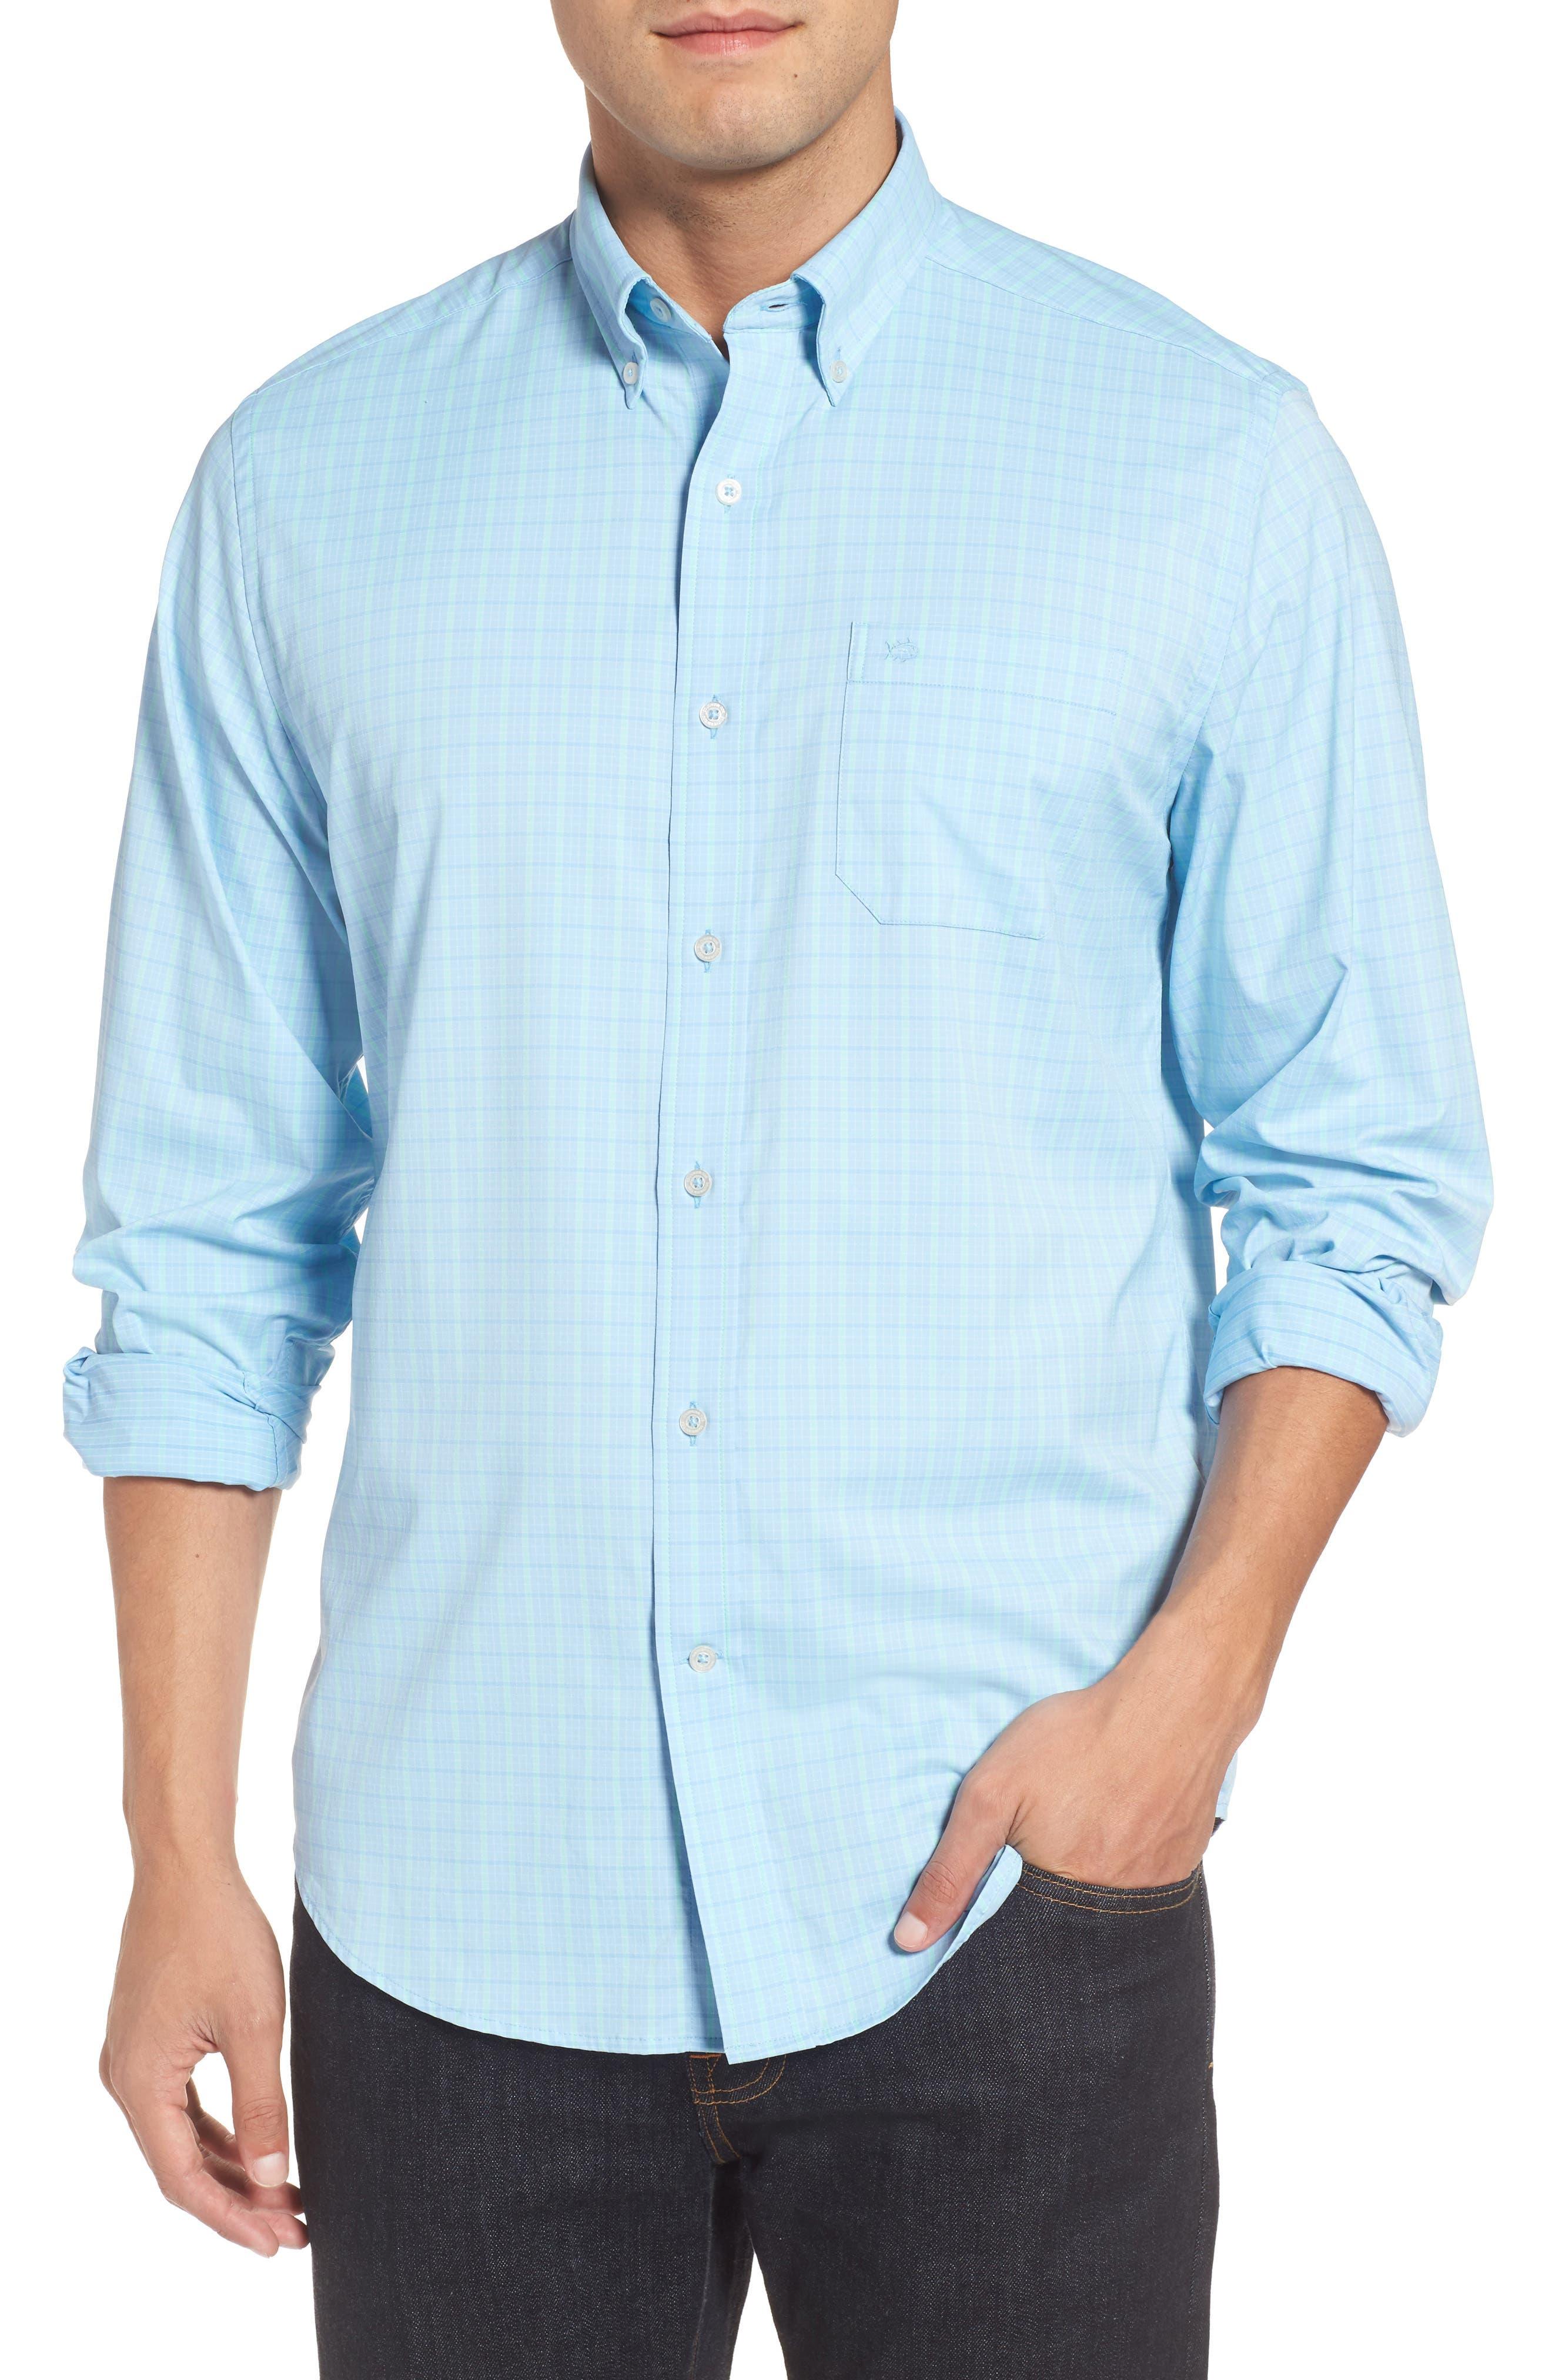 Main Image - Southern Tide Intercoastal Gordia Plaid Sport Shirt